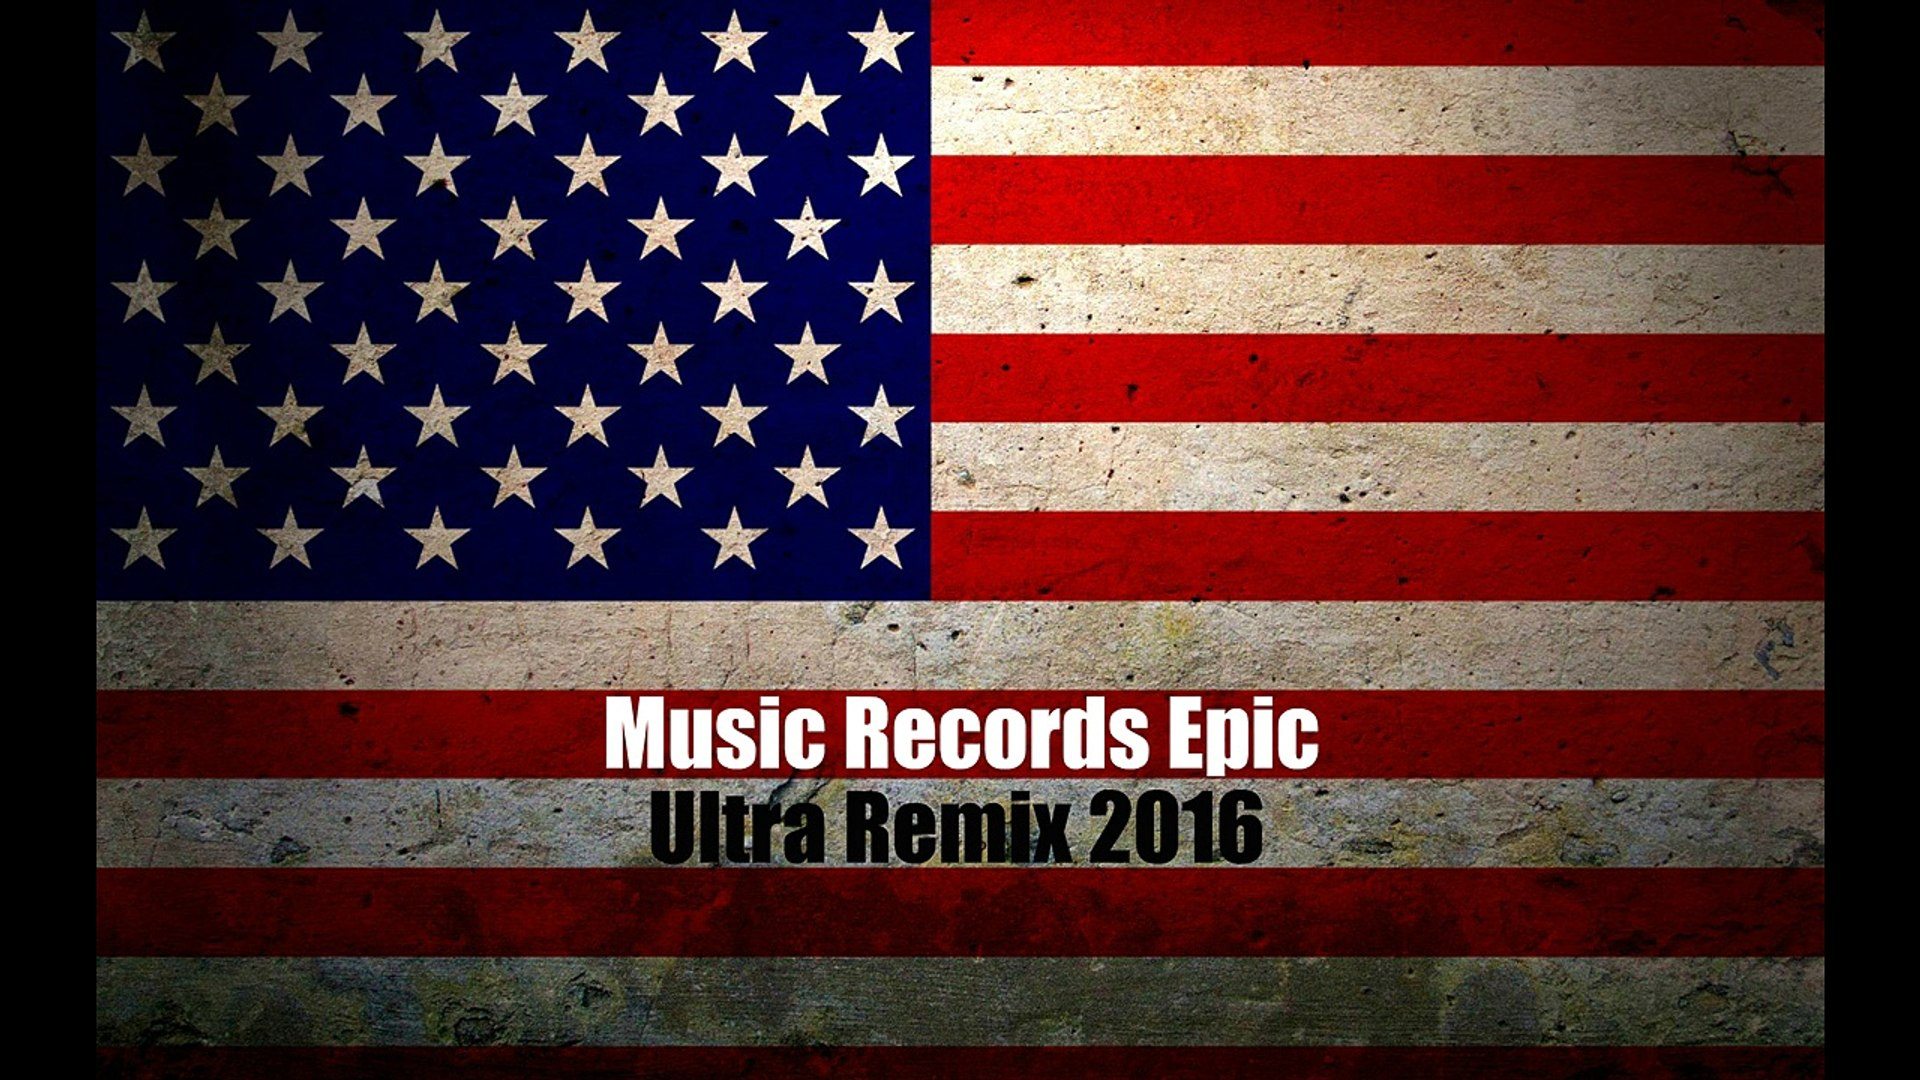 Nicki Minaj - Truffle Butter feat Drake & Lil Wayne (Aston Shuffle Remix)